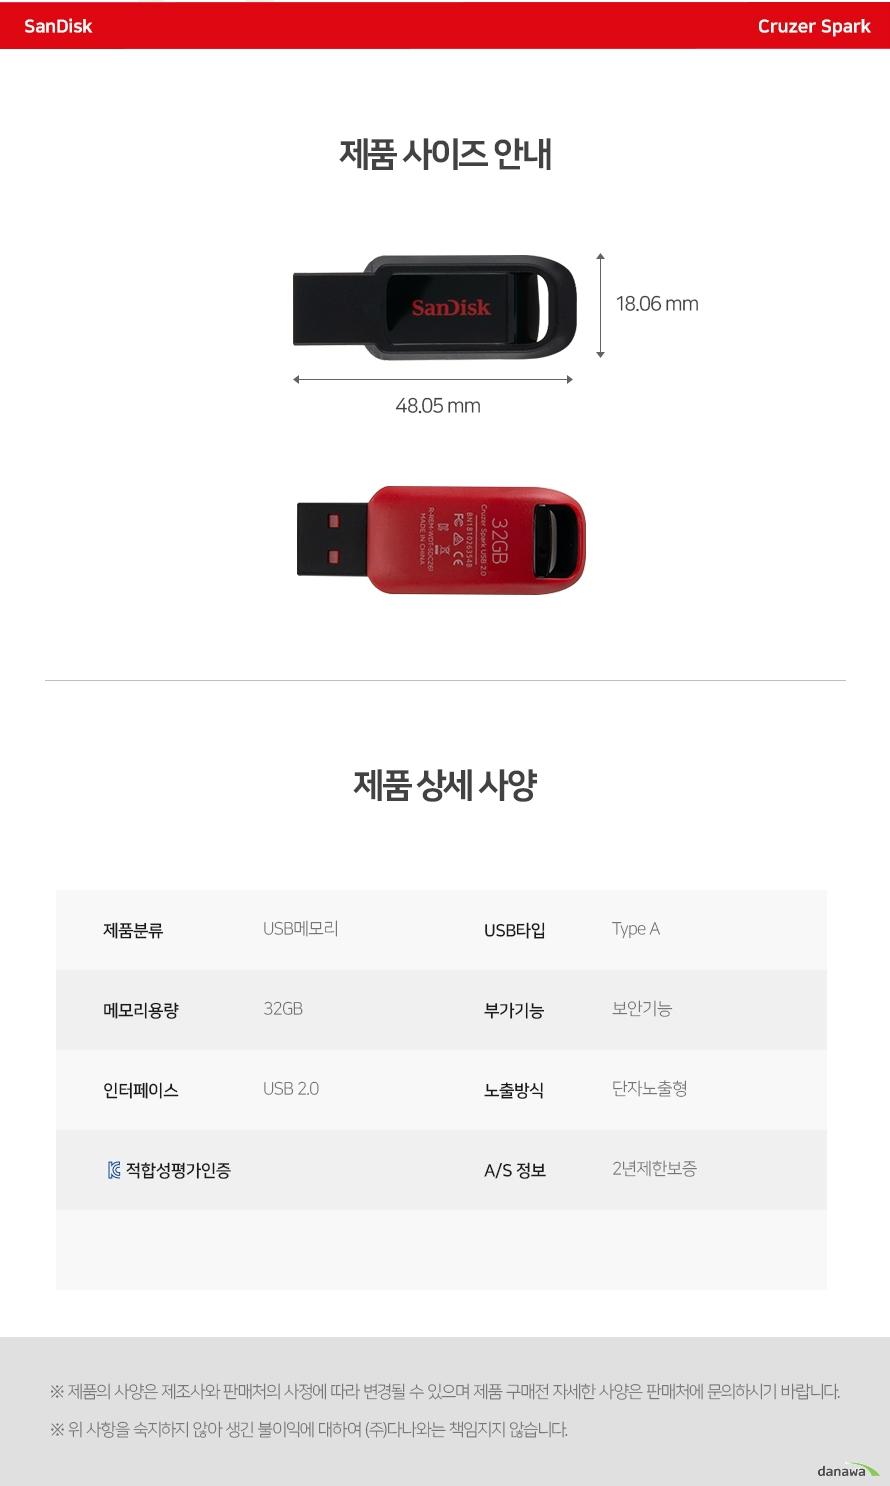 Sandisk Cruzer Spark CZ61 (32GB)